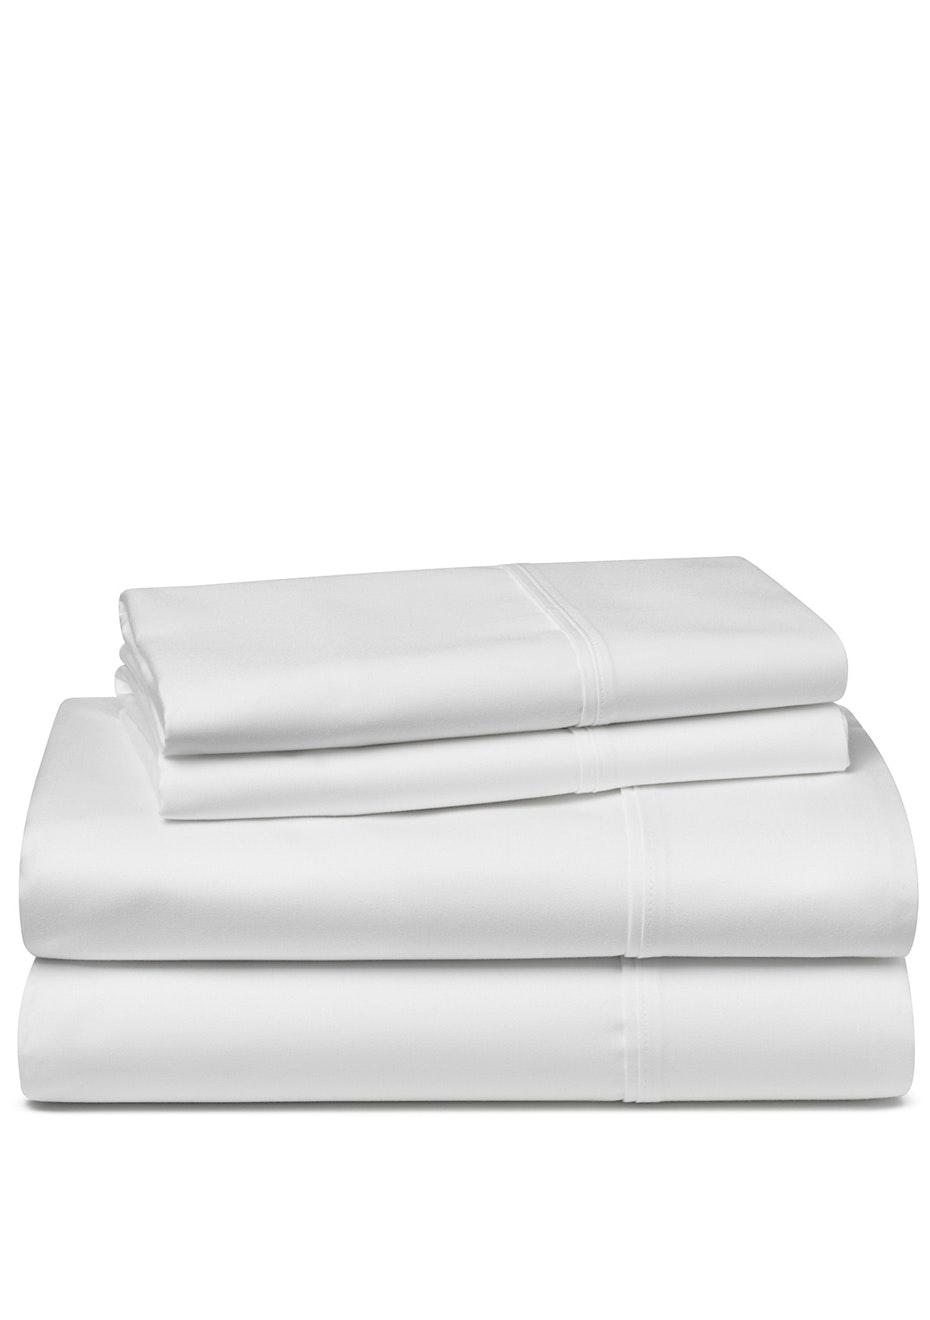 Palazzo Royale 1500TC Premium Blend Sheet Set King Bed Snow White